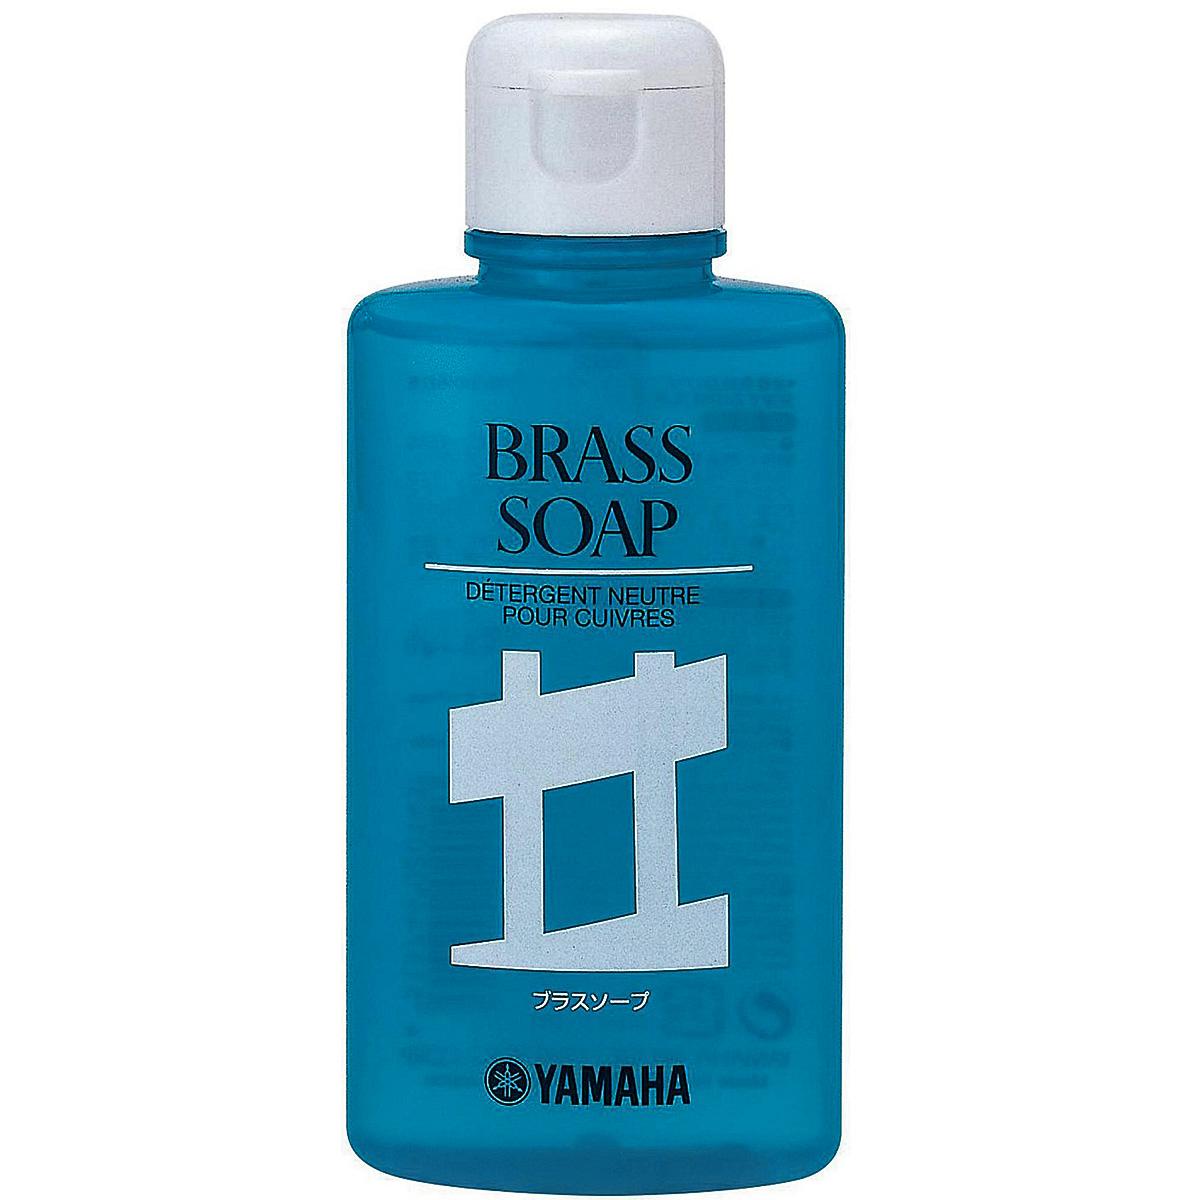 Yamaha YHBARSP: Brass Soap Cleaner